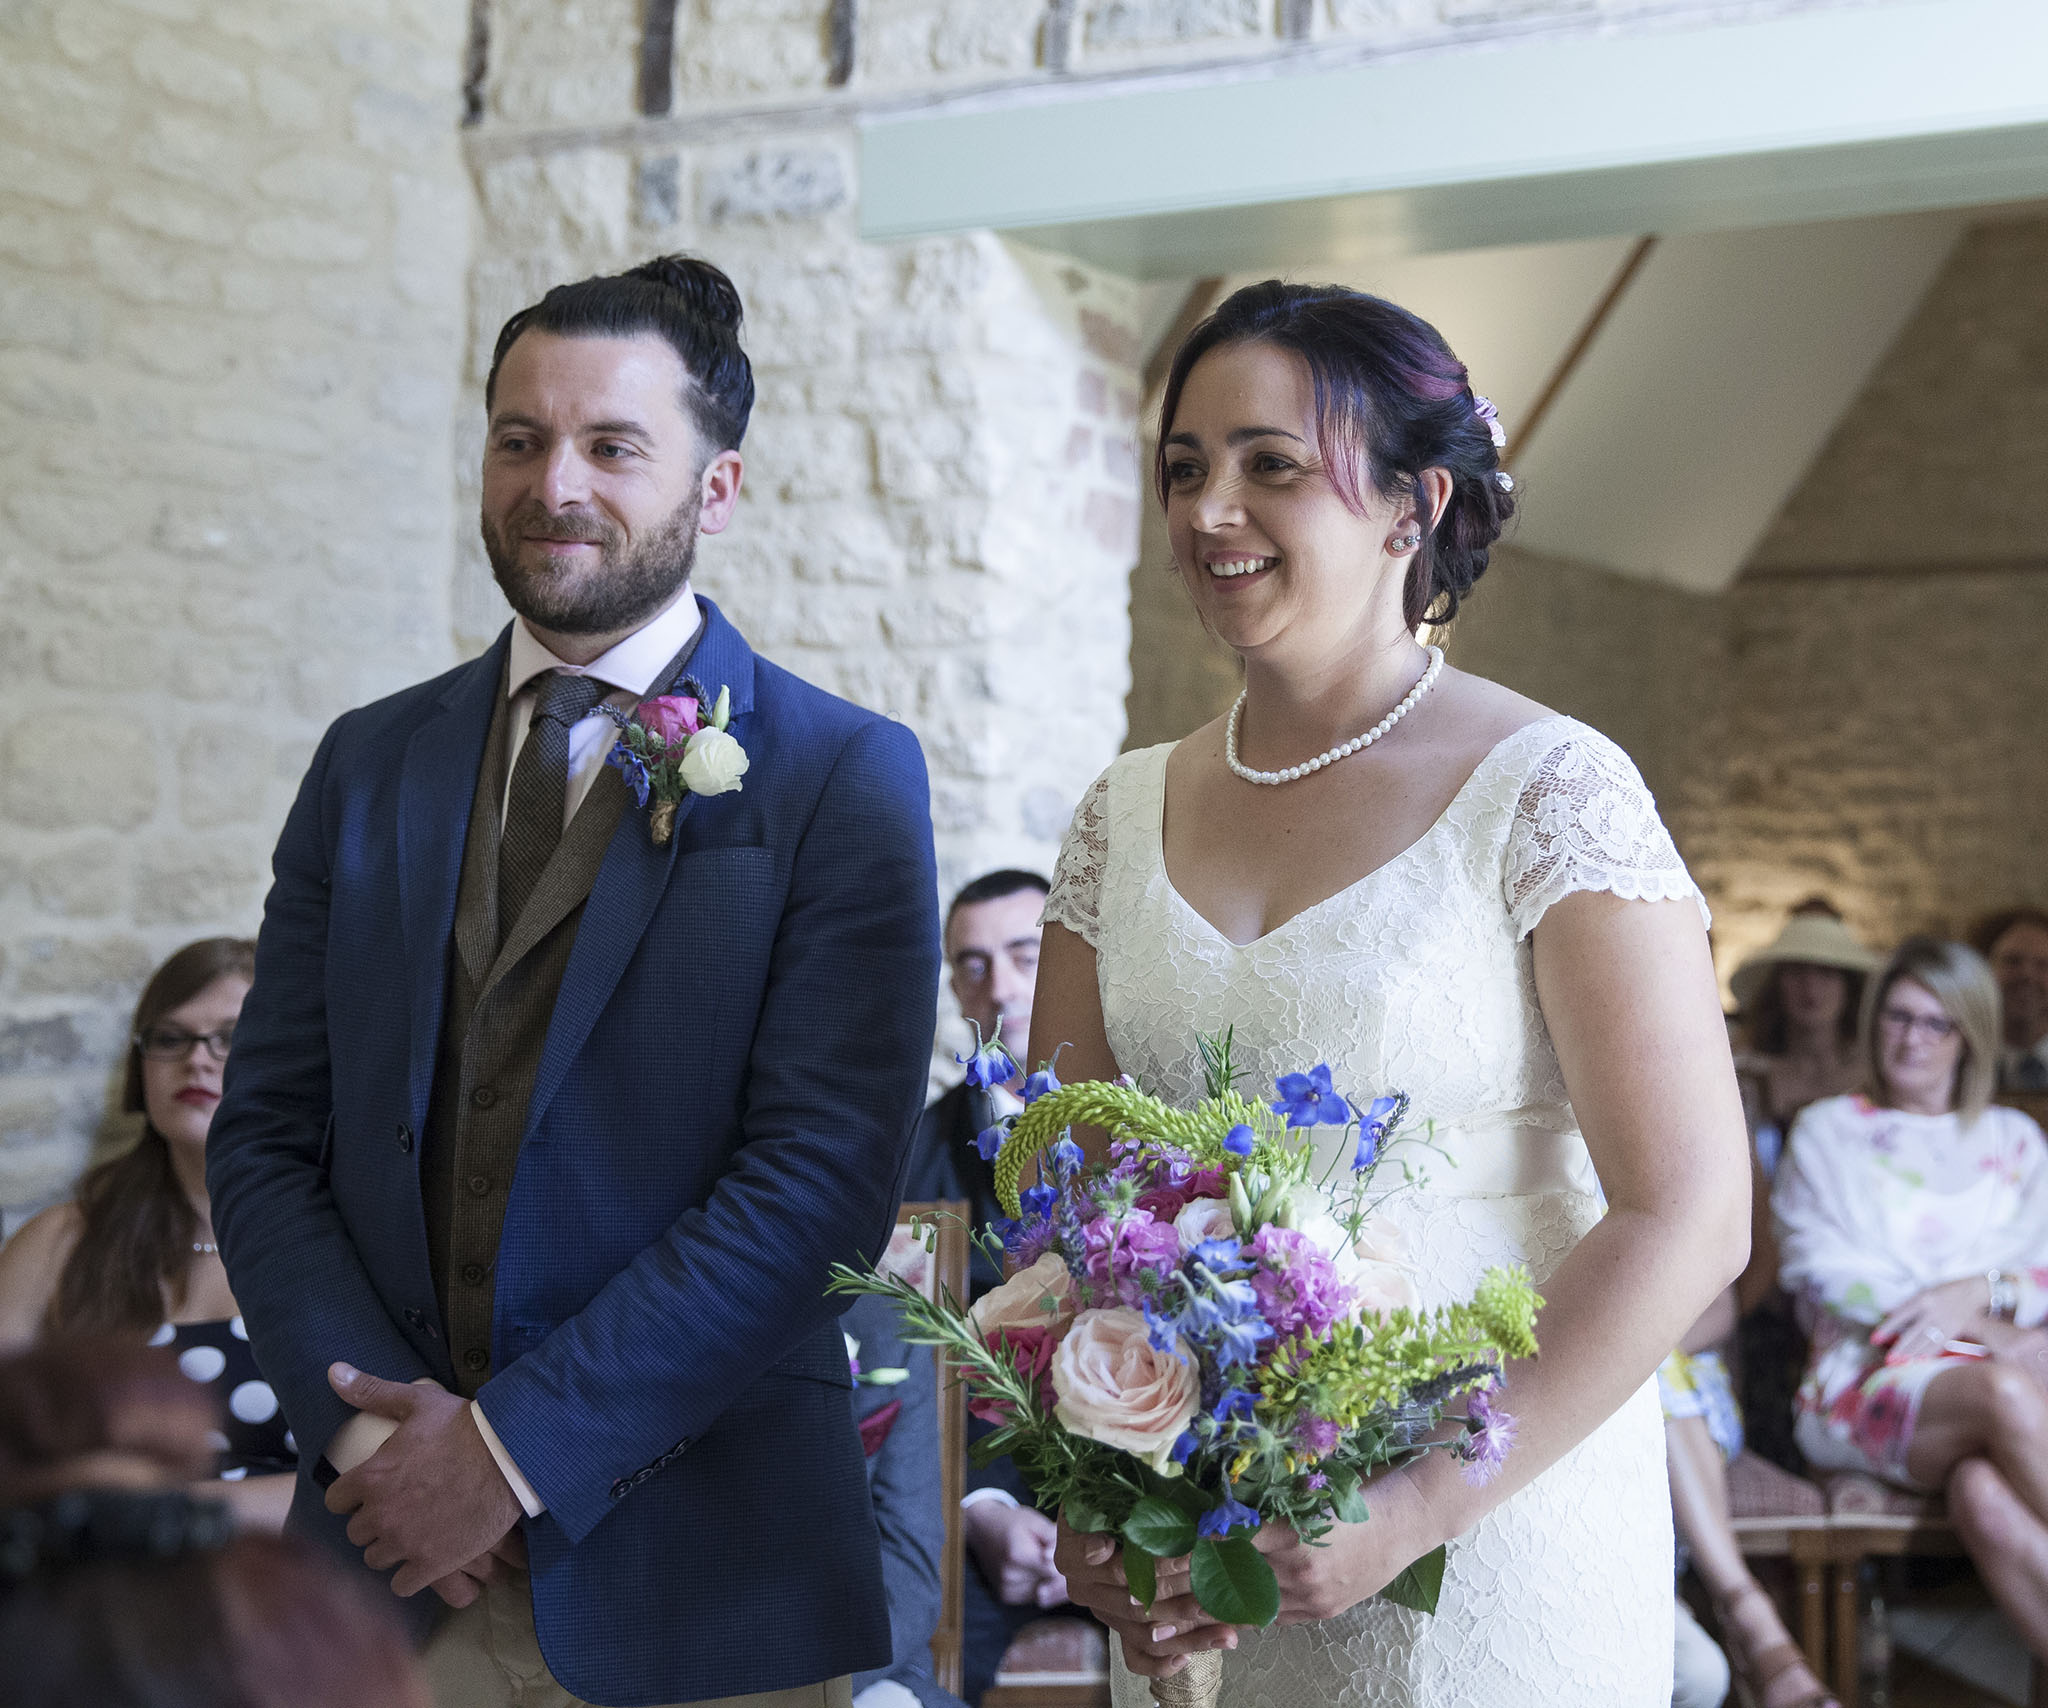 elizabethgphotography_kingslangley_hertfordshire_fineart_wedding_photography_lincolnshire_anna_simon_16.jpg